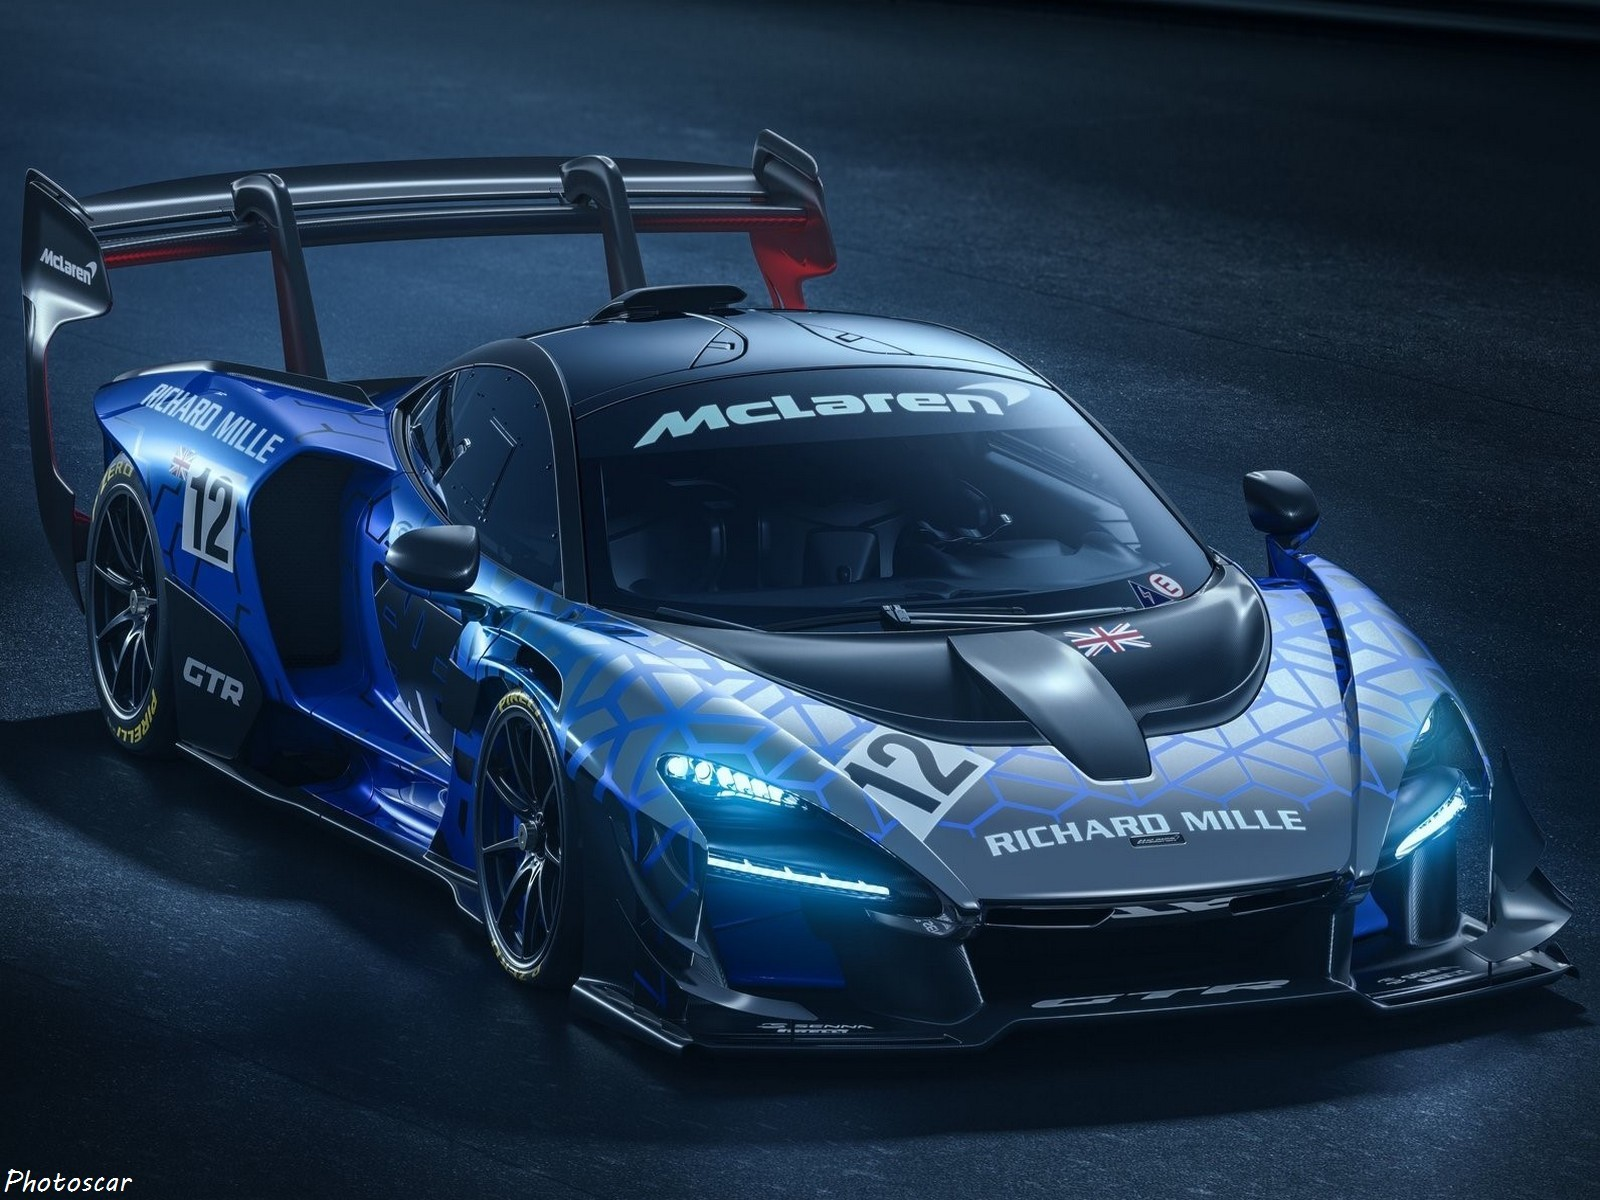 McLaren Senna GTR 2020